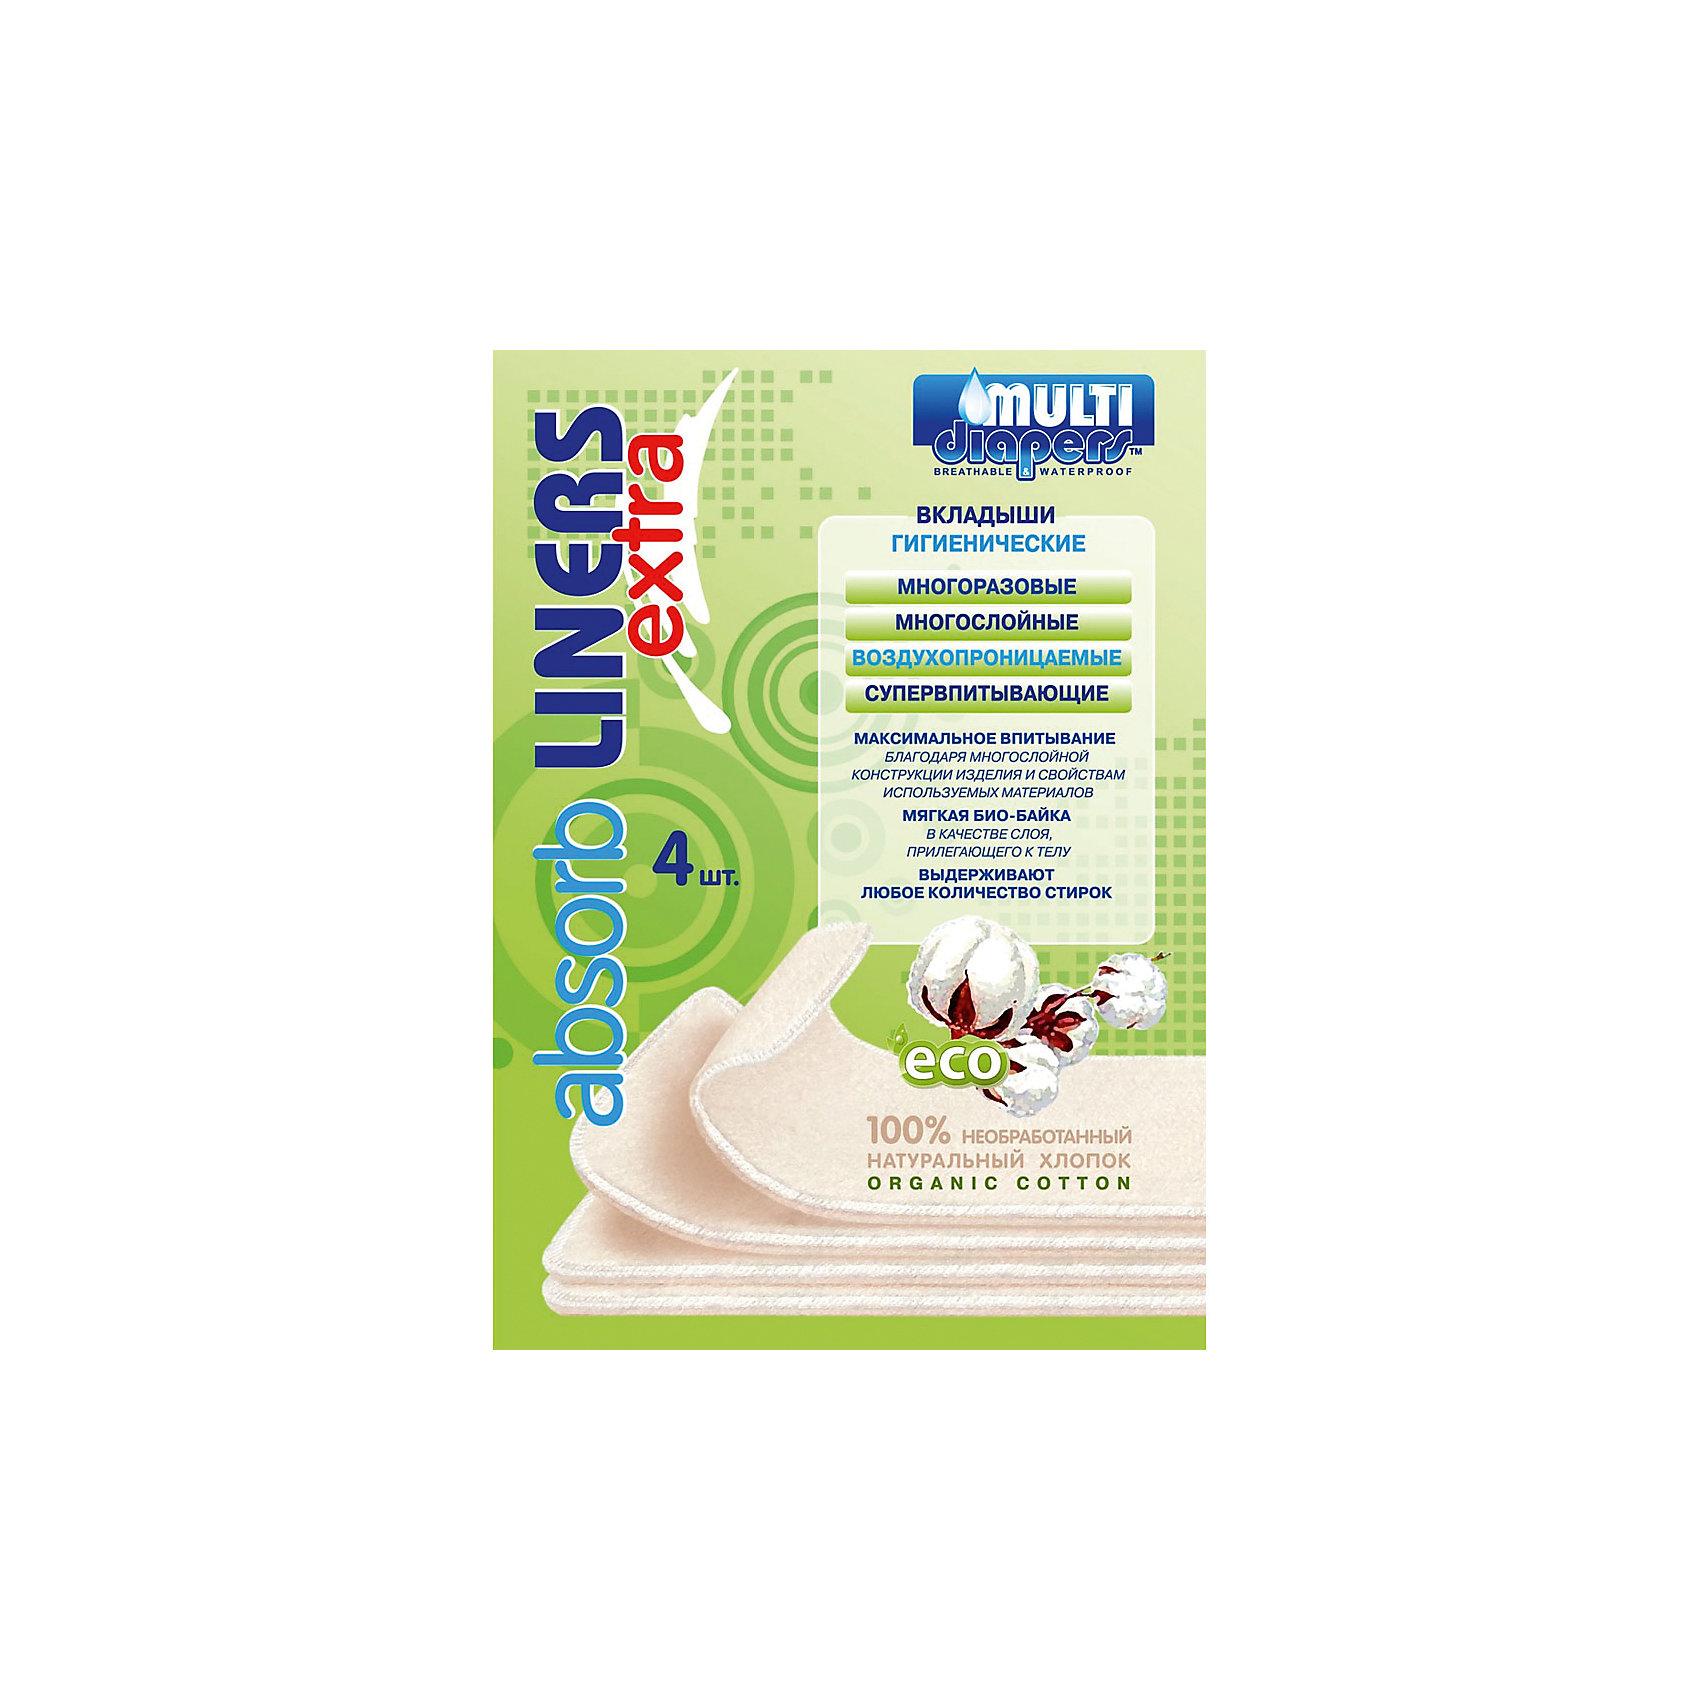 Многоразовые вкладыши Extra (4 шт), Multi Diapers